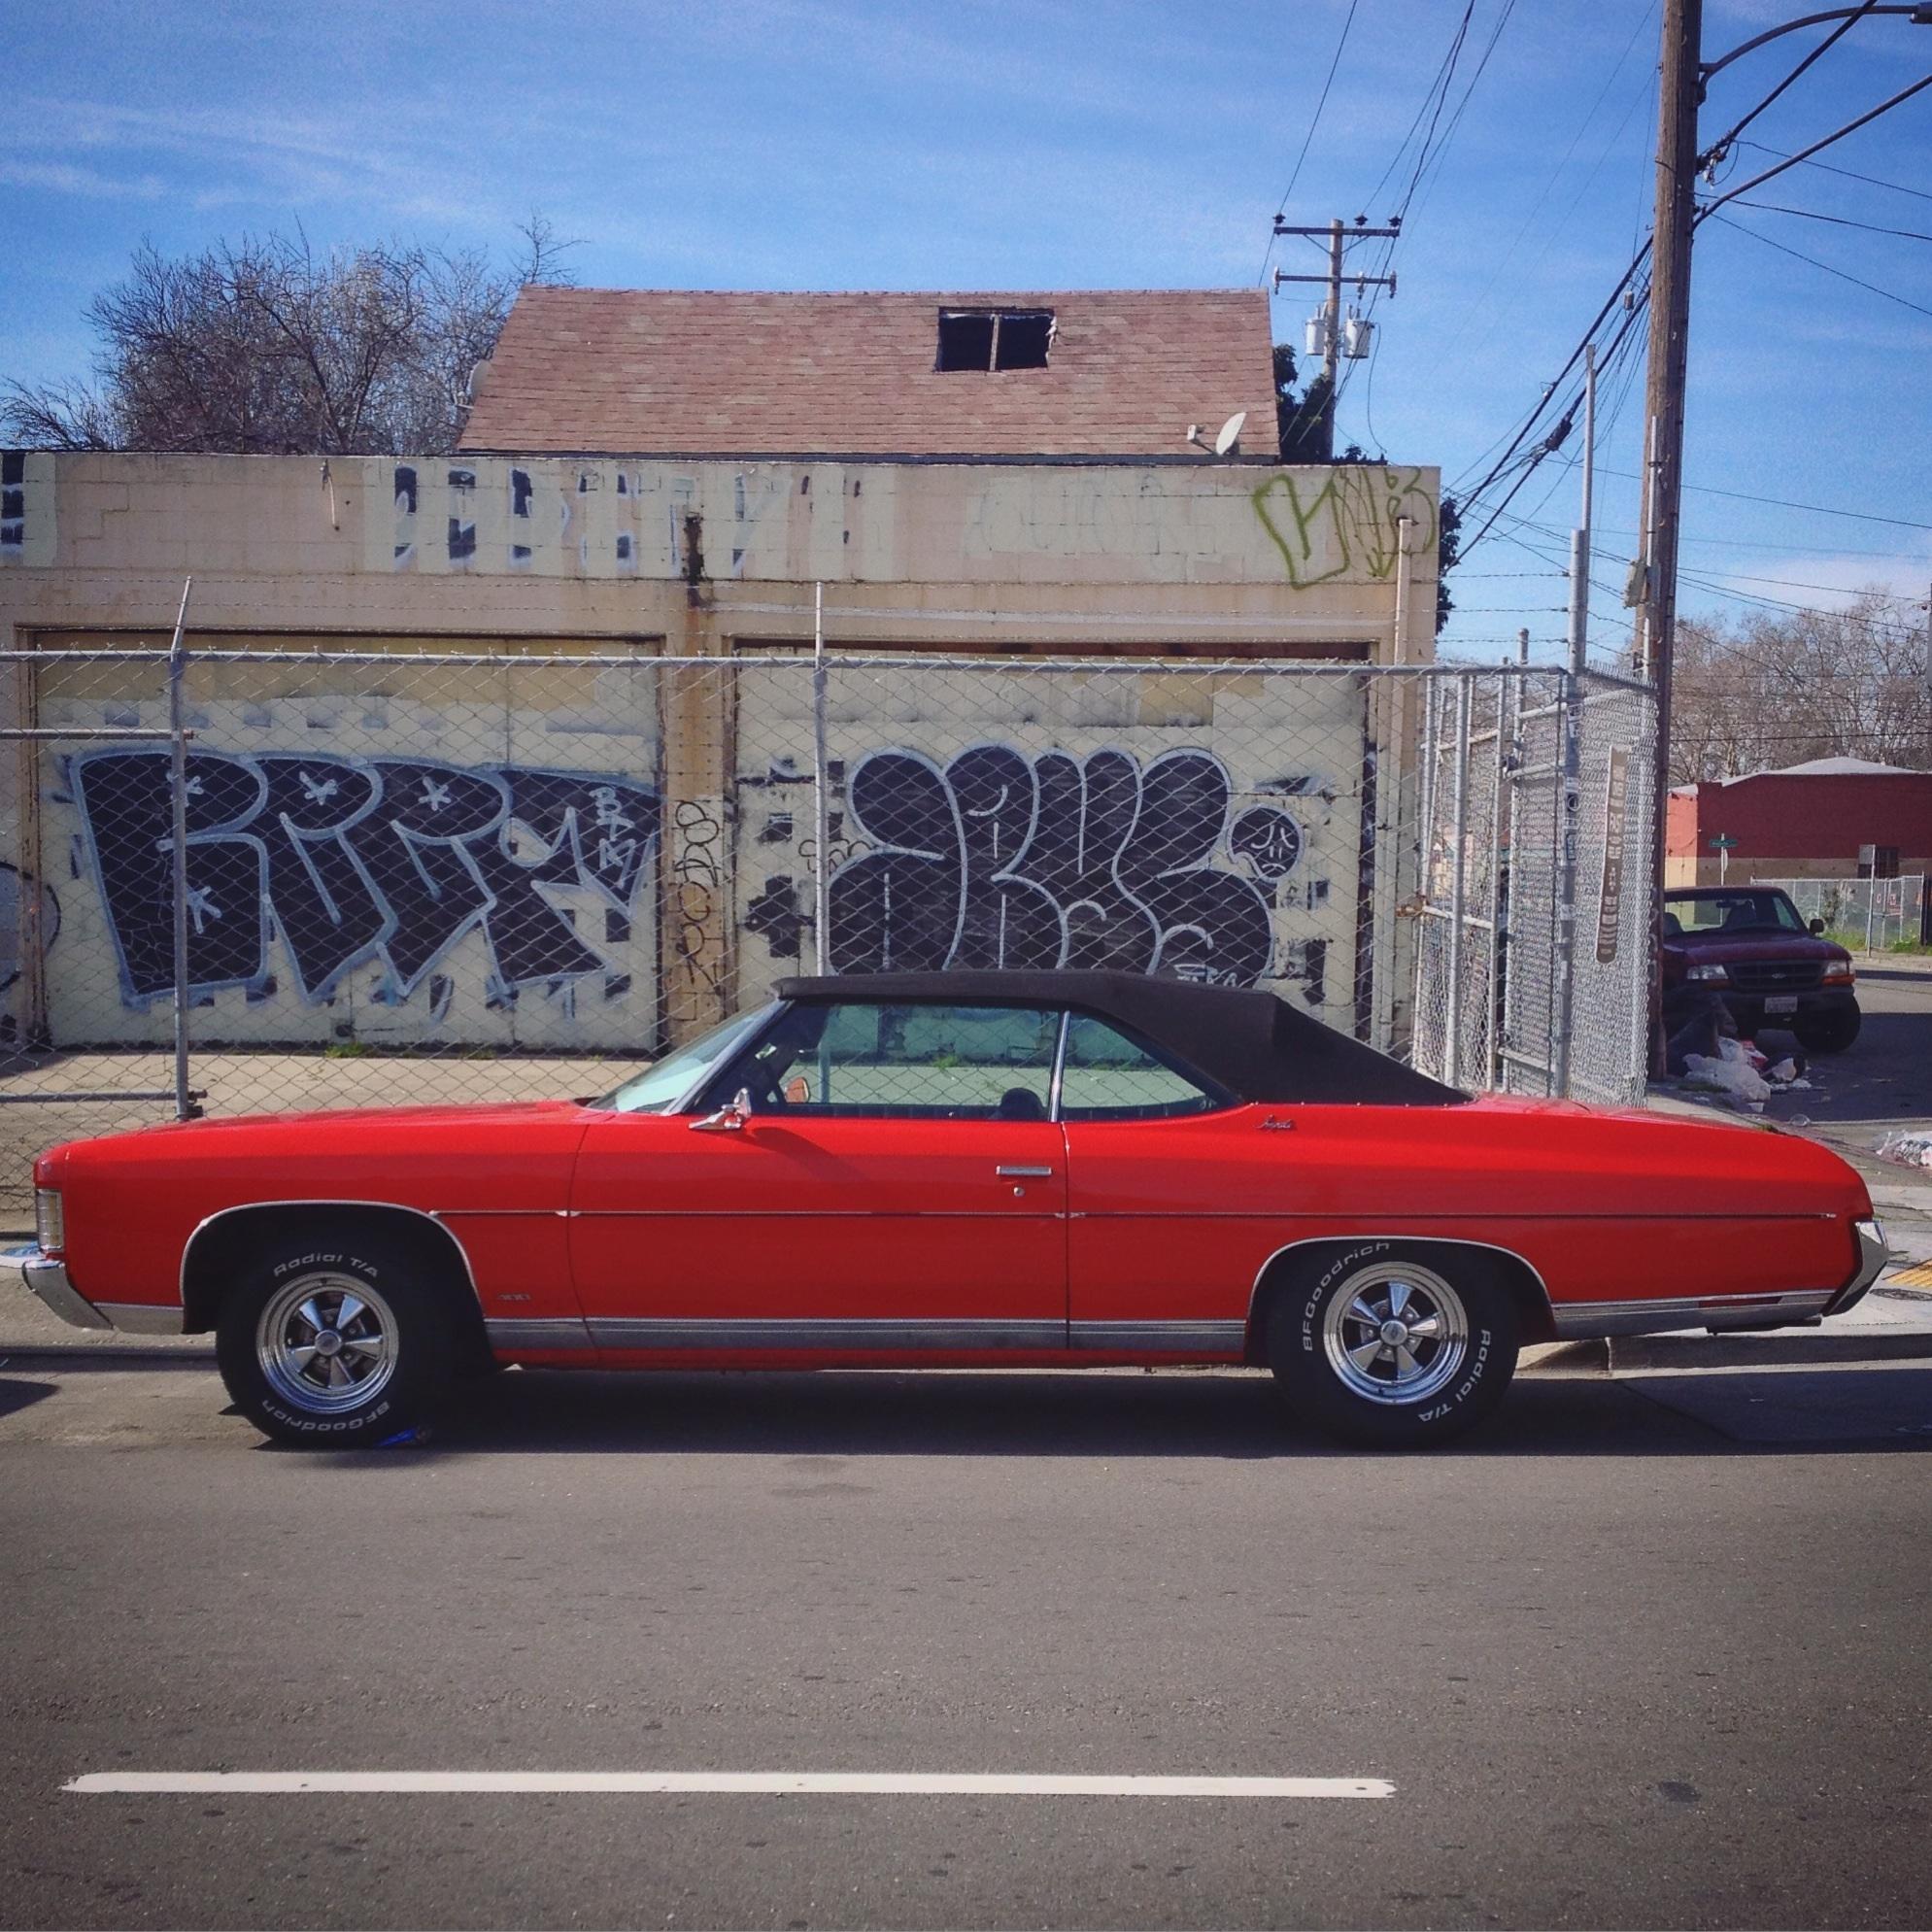 Found In Clawson Oakland California 1971 Chevrolet Impala Convertible Dynamic Drive